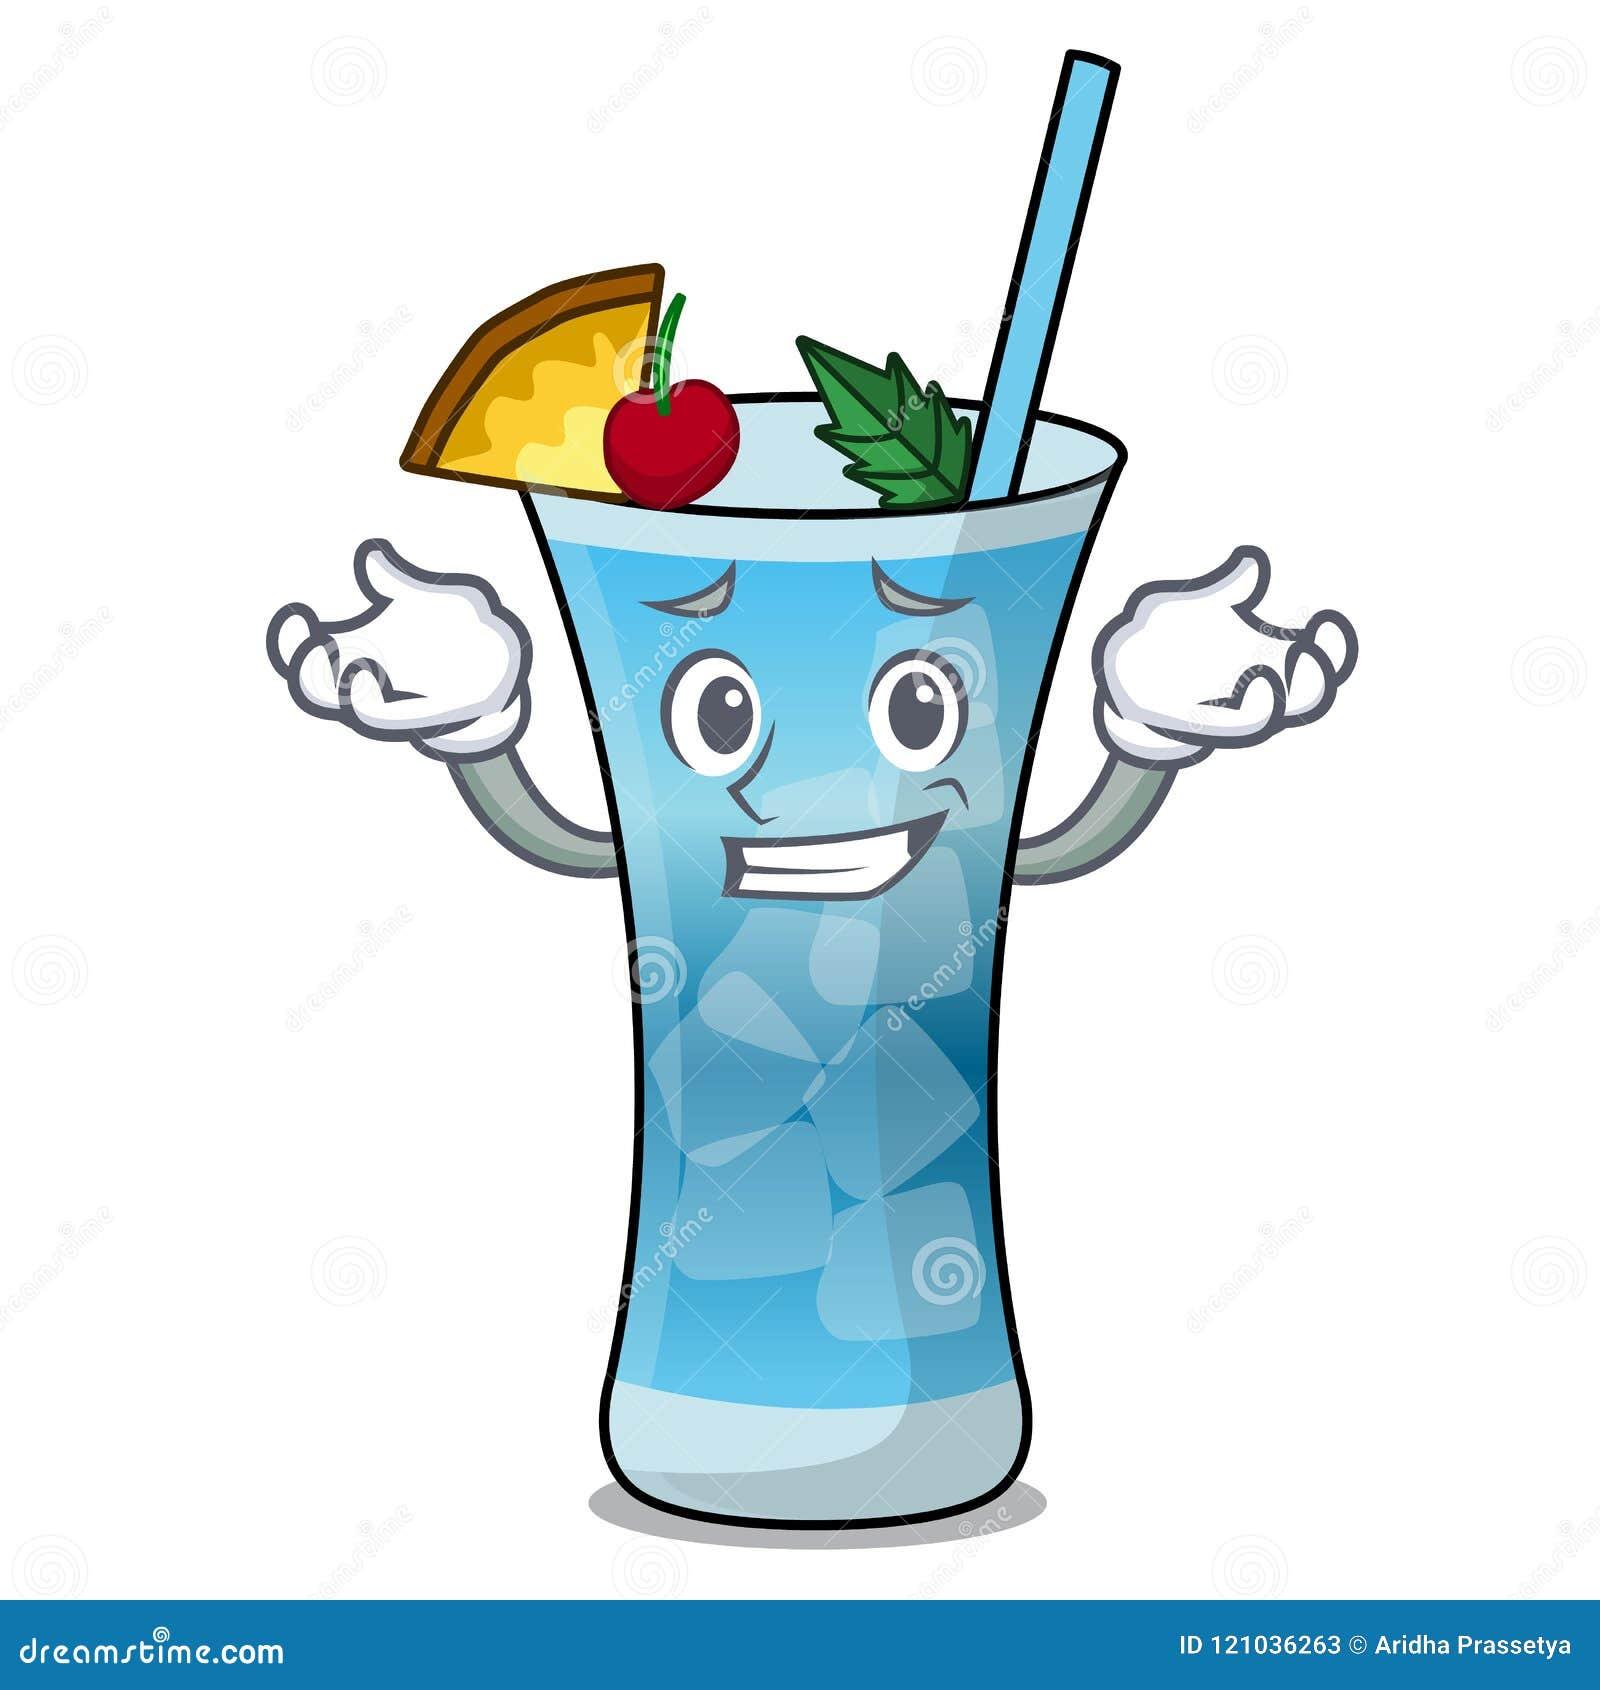 Sorrindo Desenhos Animados Azuis Do Carater De Havai Ilustracao Do Vetor Ilustracao De Feixe Vidro 121036263